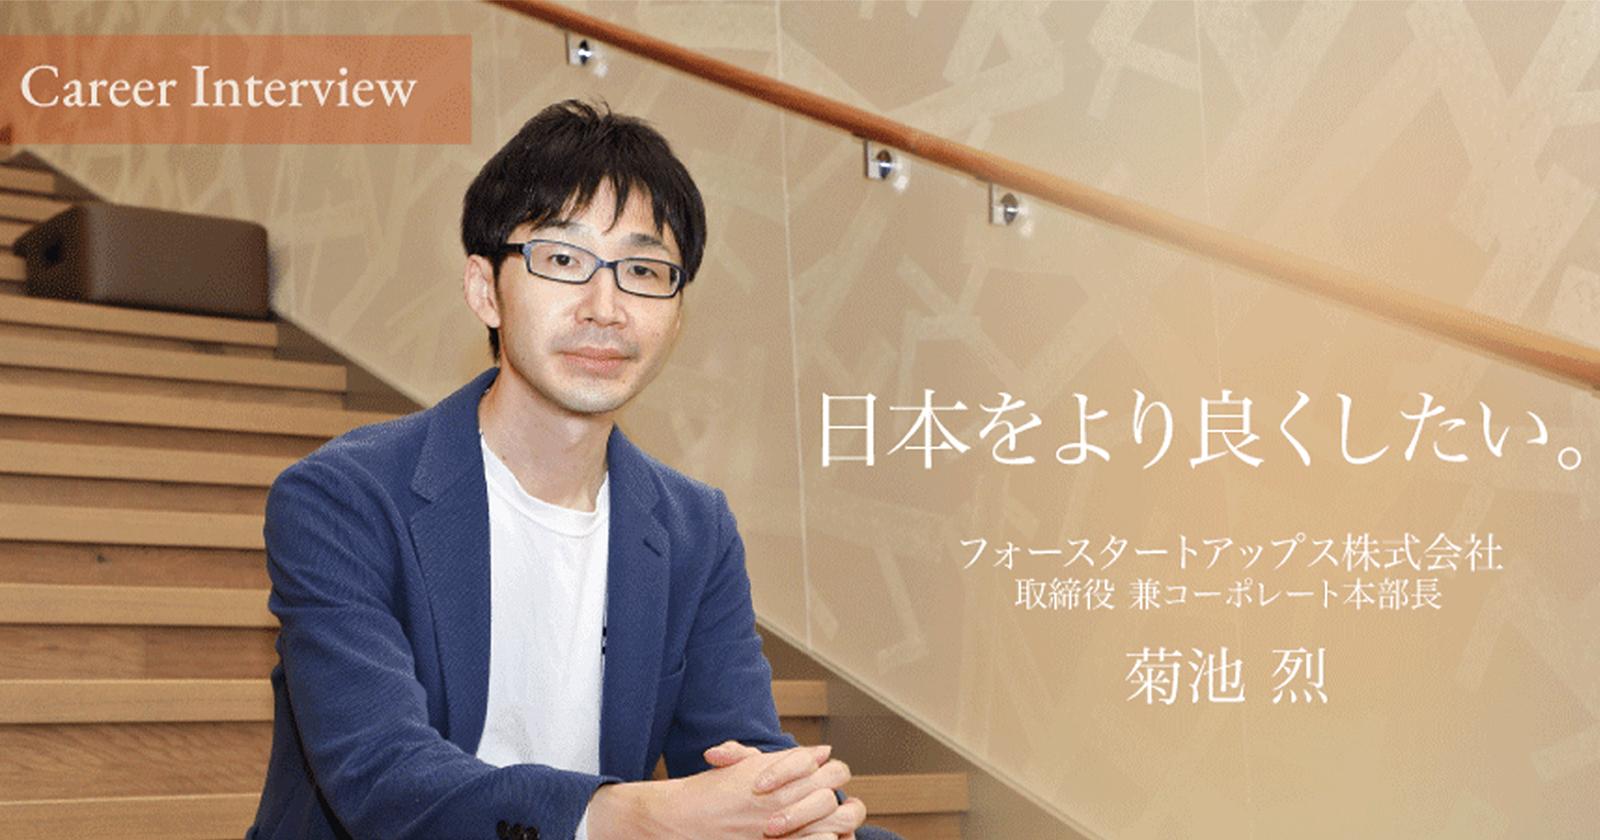 「HUPRO・MAGAZINE」のCFOインタビューにて、当社取締役 コーポレート本部長 菊池 烈 のインタビュー記事が掲載されました。